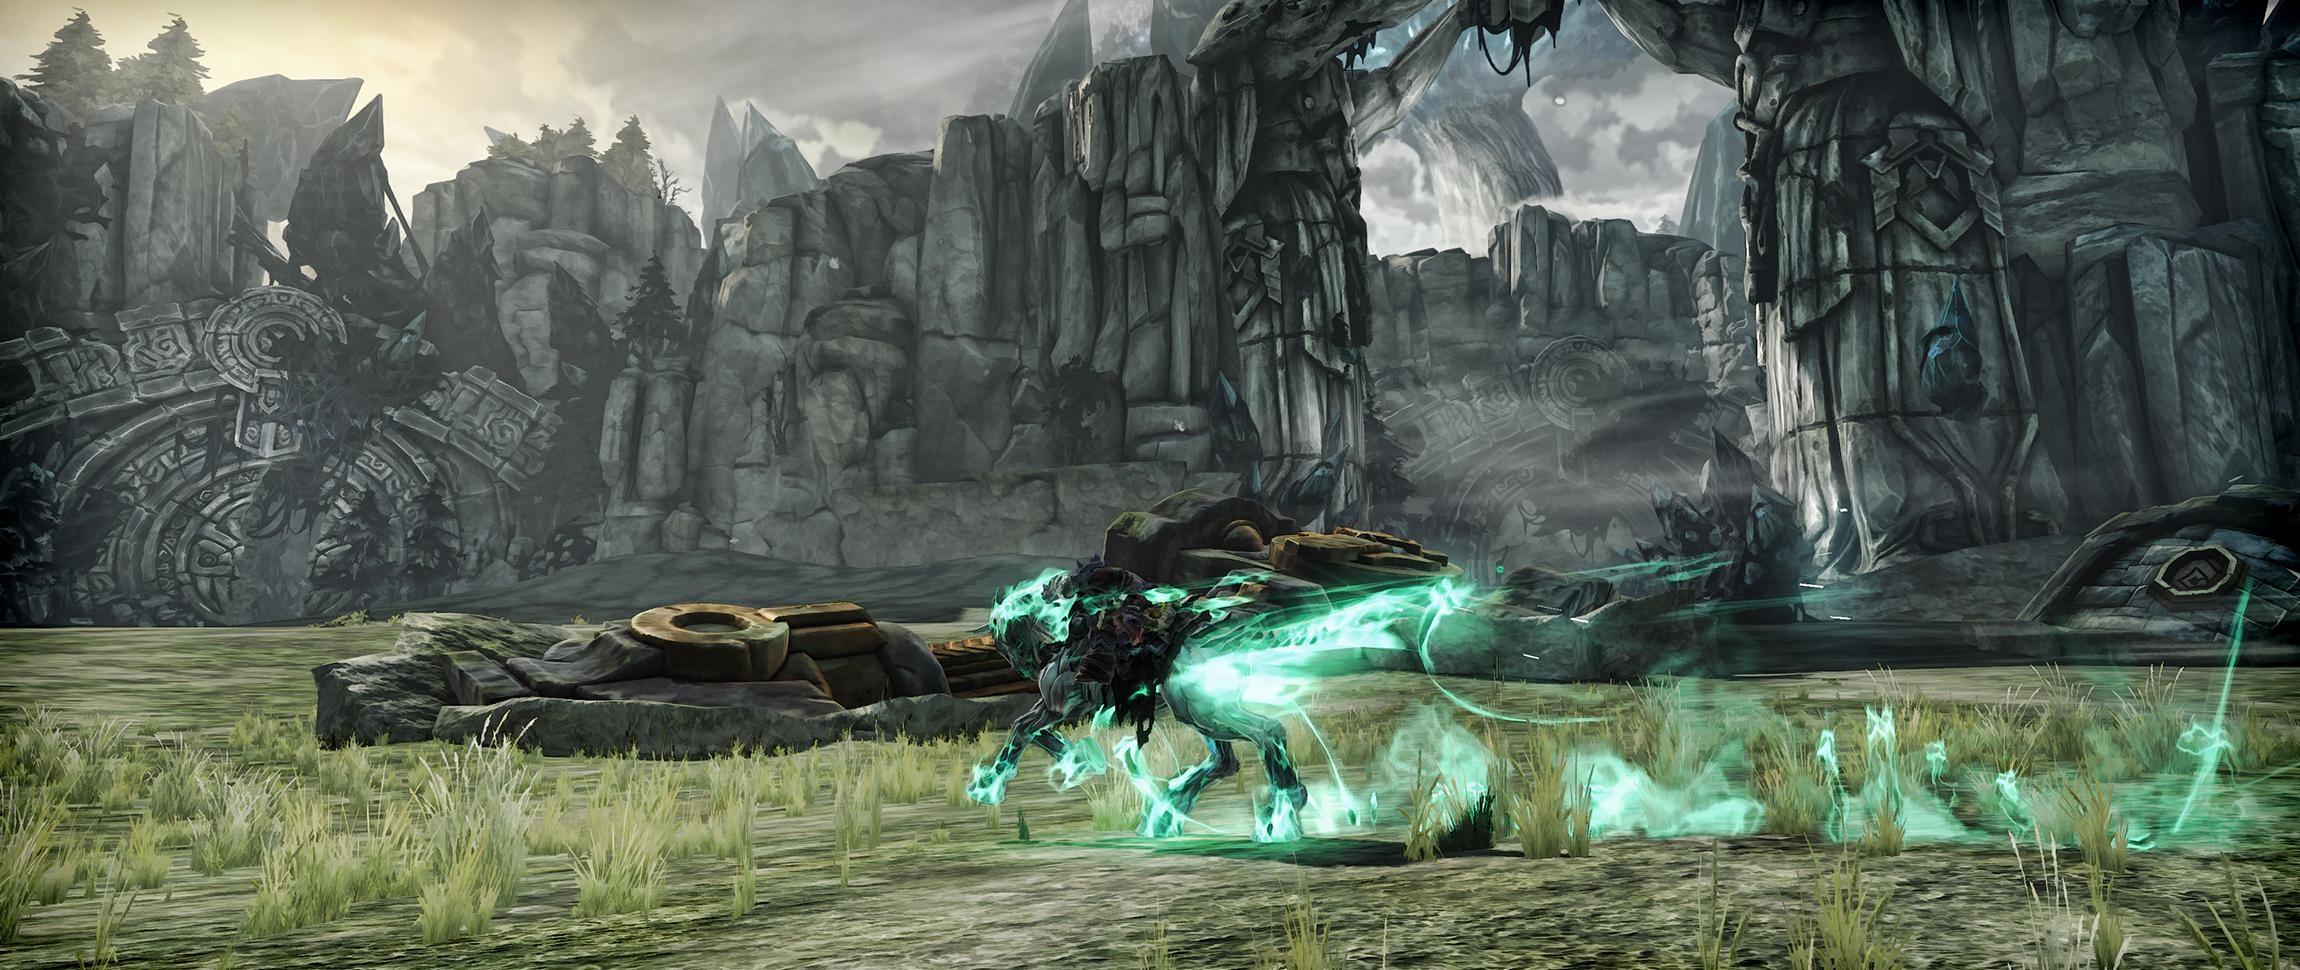 Wallpaper Video Games Jungle Darksiders 2 Terrain